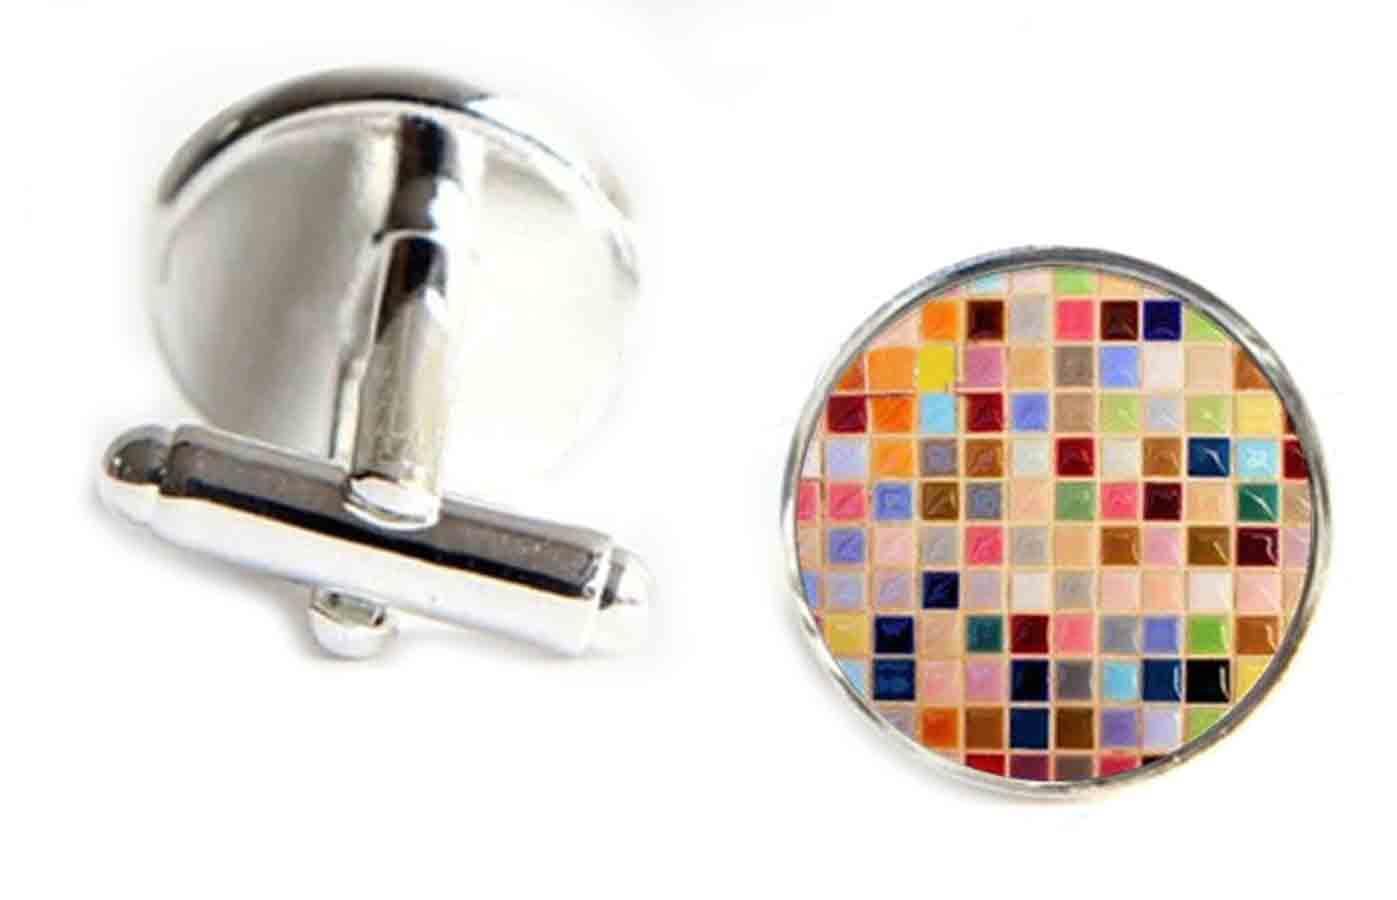 Gascoigne Mosaic Tiles Cufflinks Silver Metal Alloy Men's